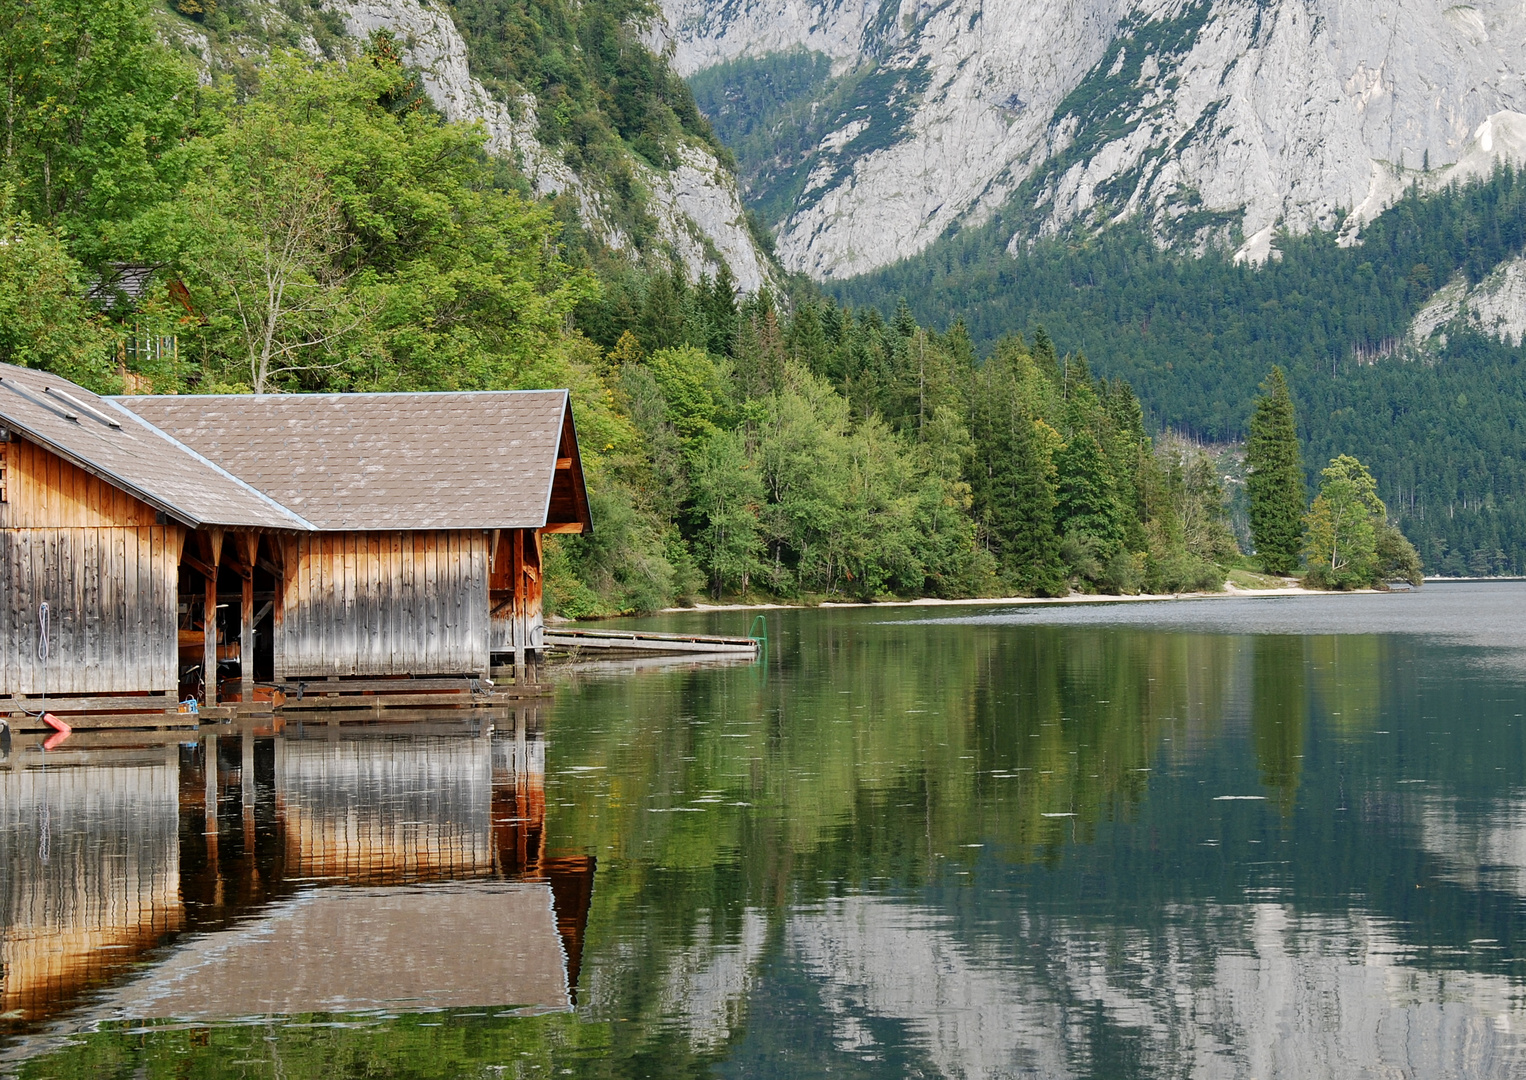 Spiegelungen am Toplitzsee